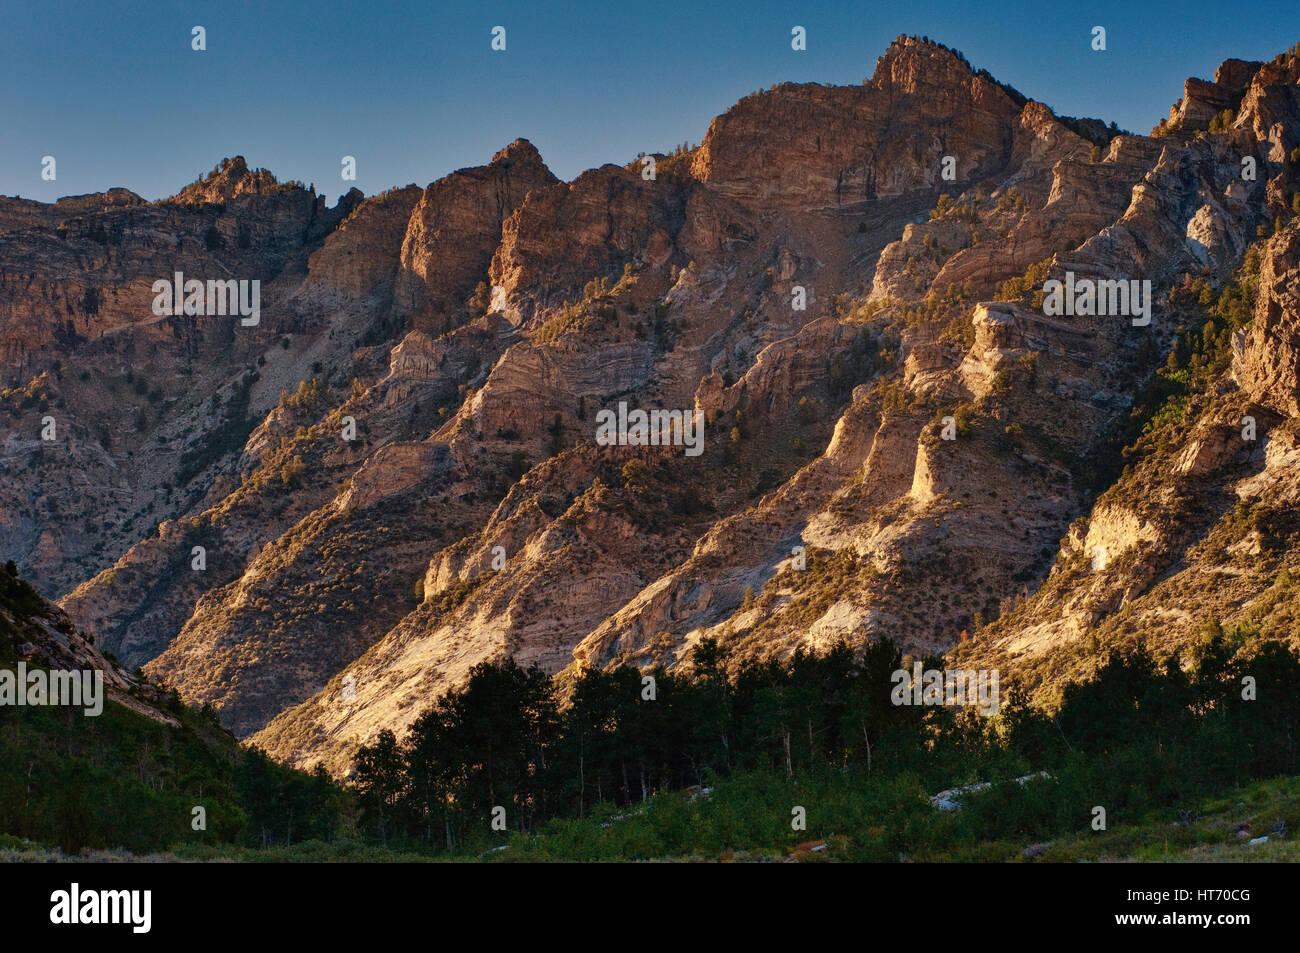 Lamoille Canyon in Ruby Mountains, sunset, near Elko, Nevada, USA - Stock Image